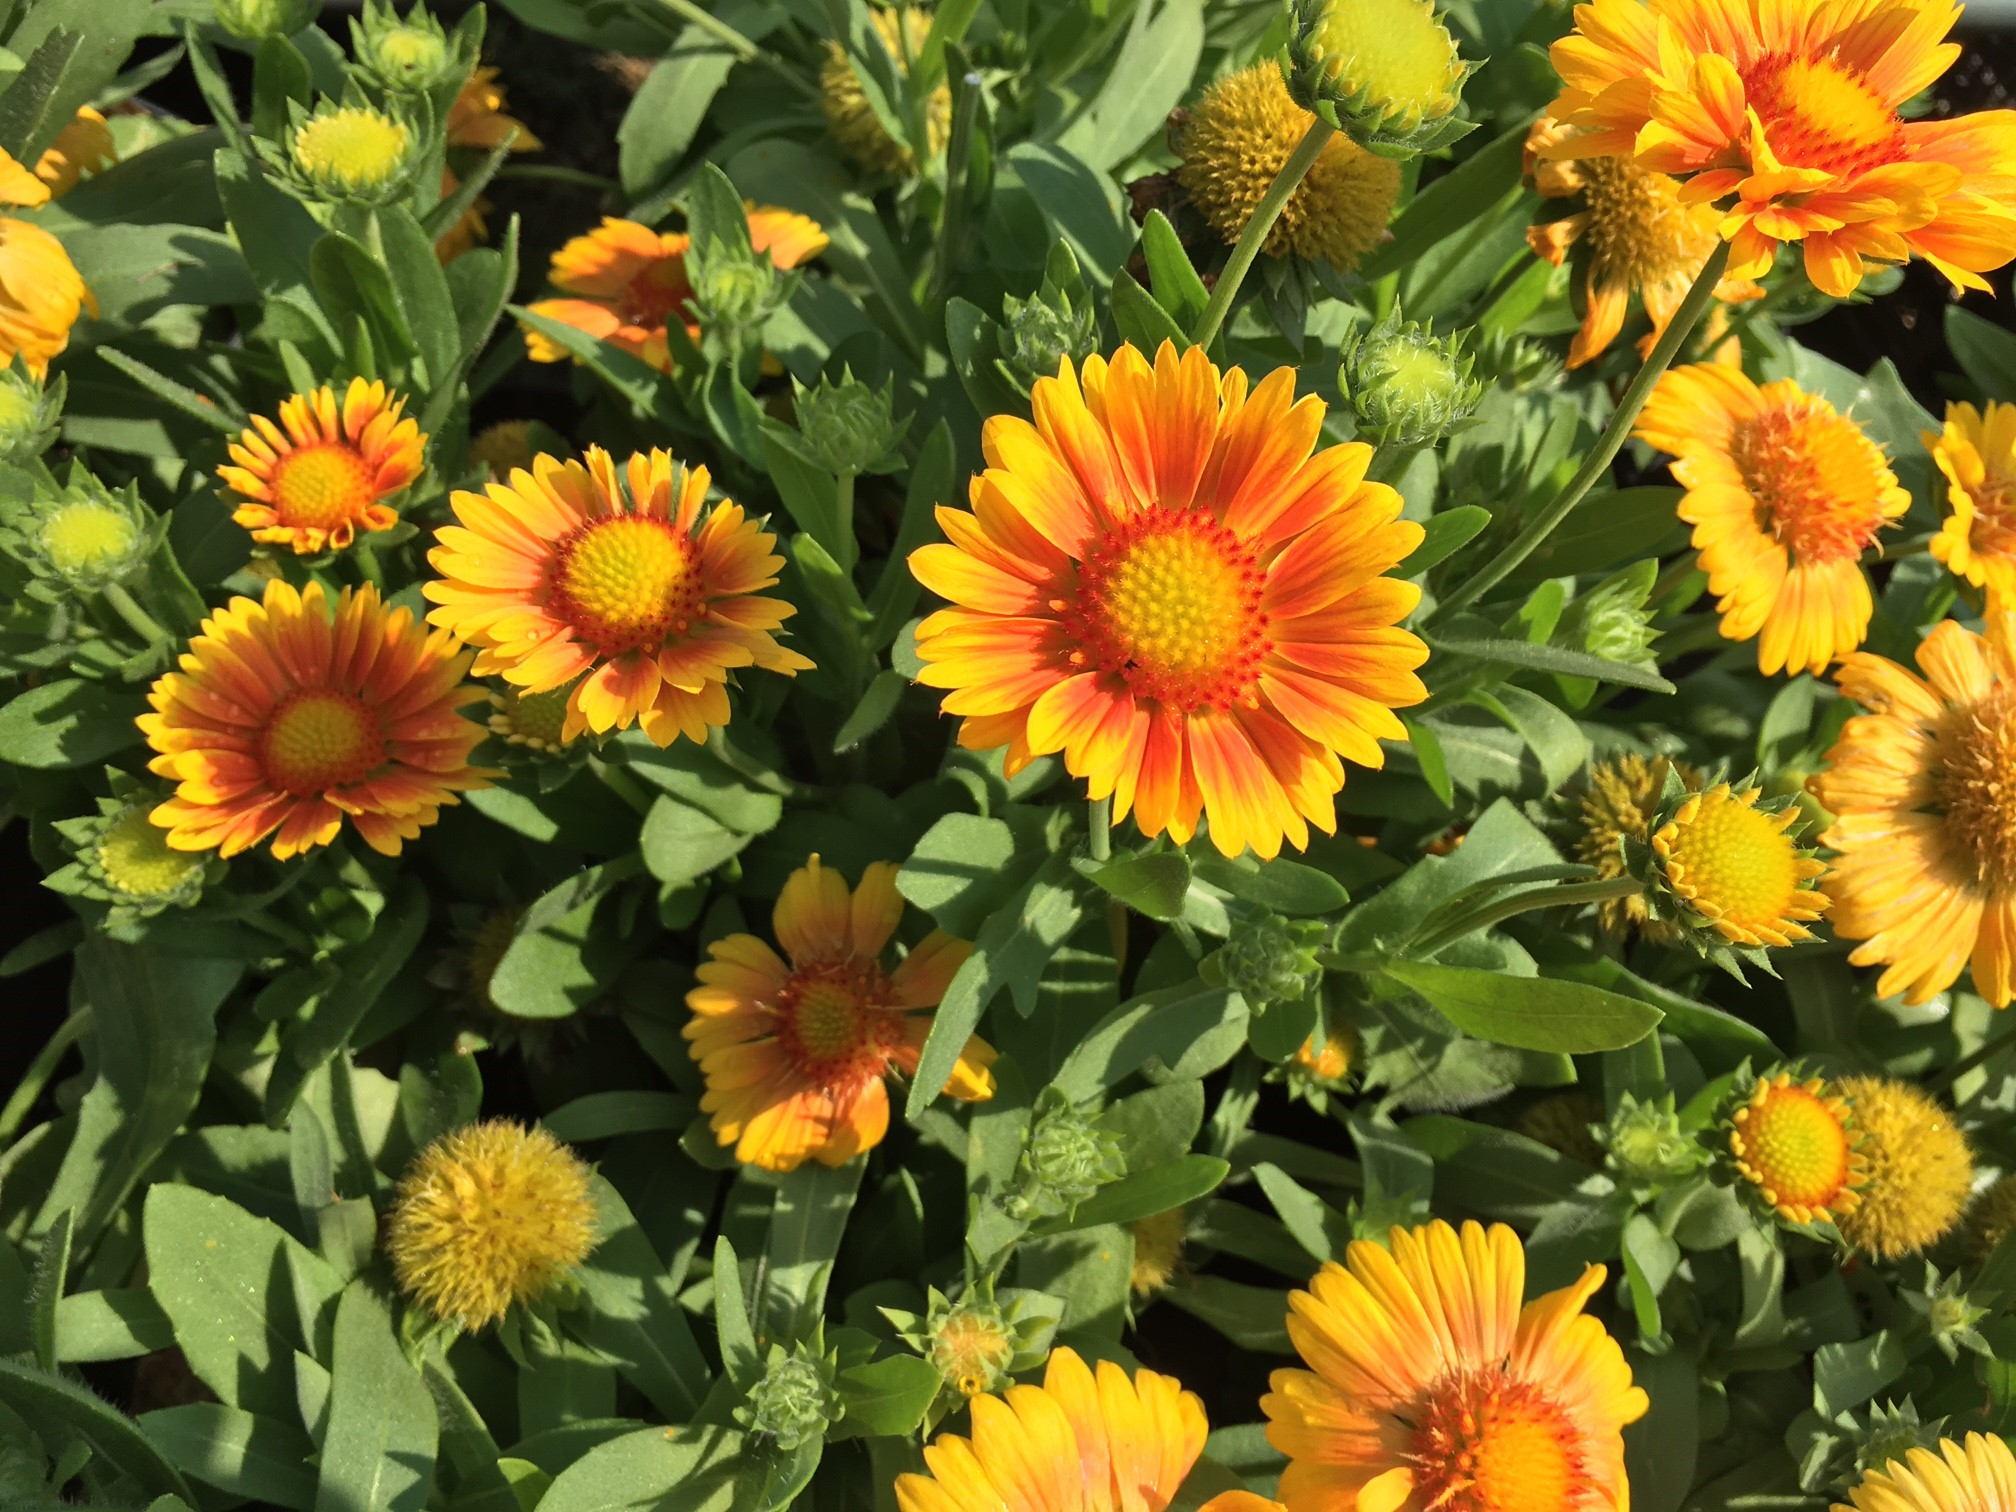 Gaillardia Blanket Flower Knechts Nurseries Landscaping